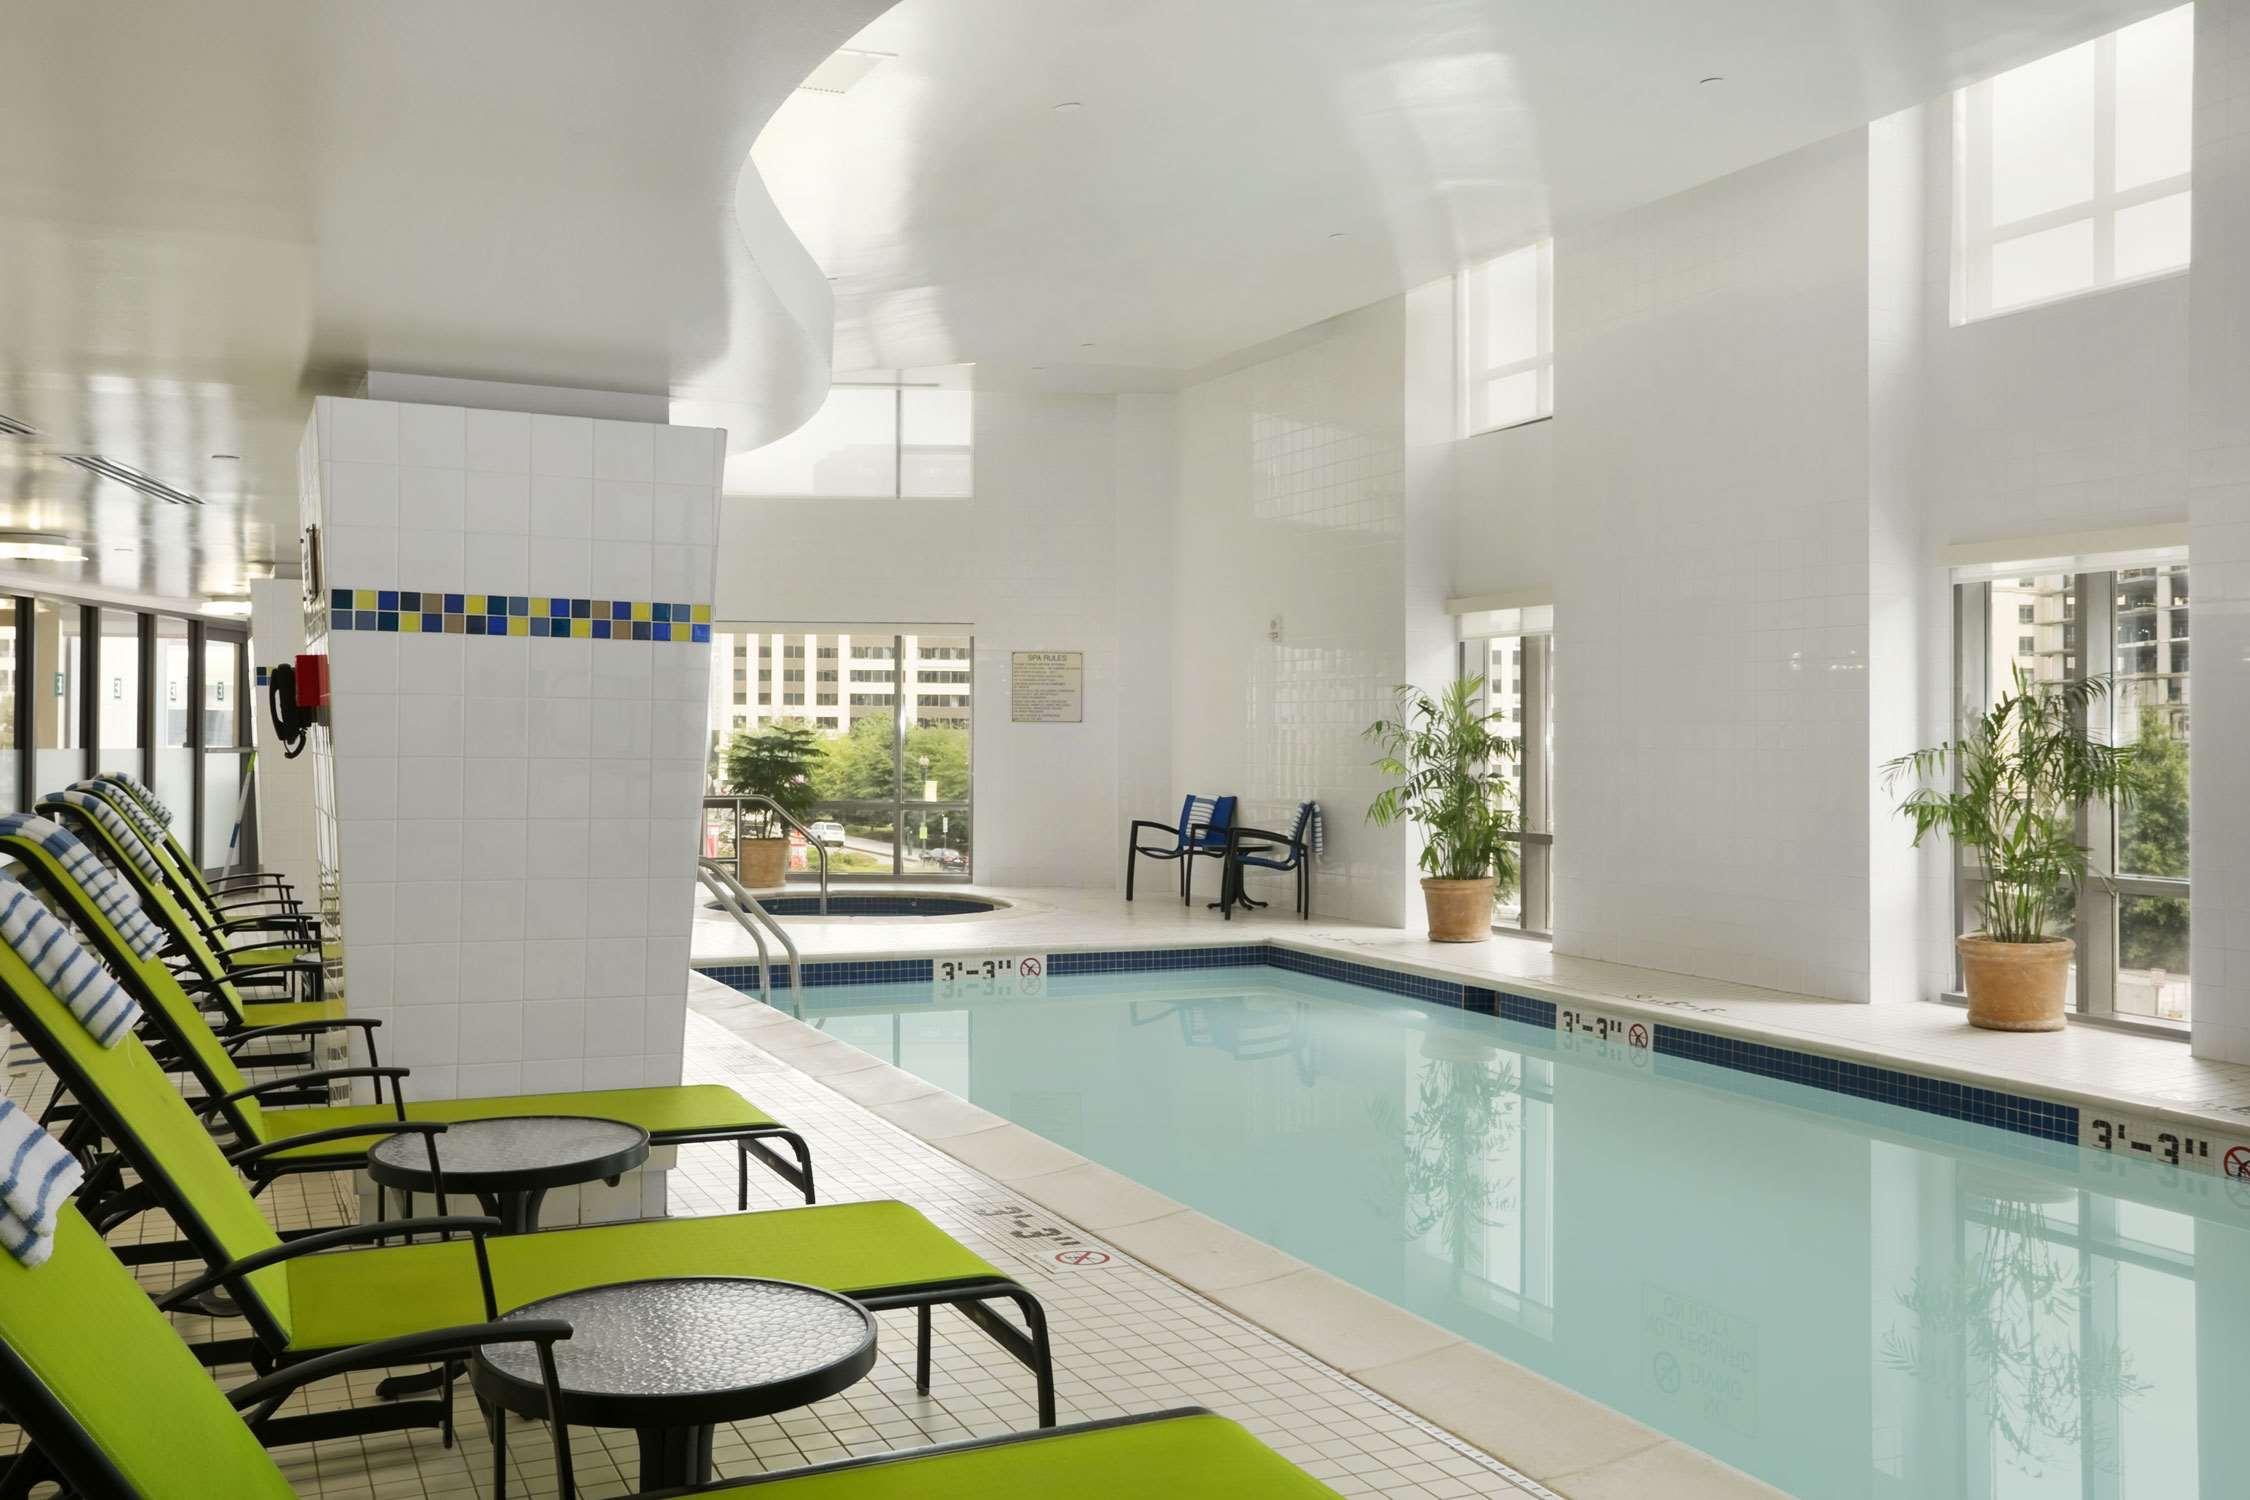 Embassy Suites by Hilton Washington DC Convention Center image 5